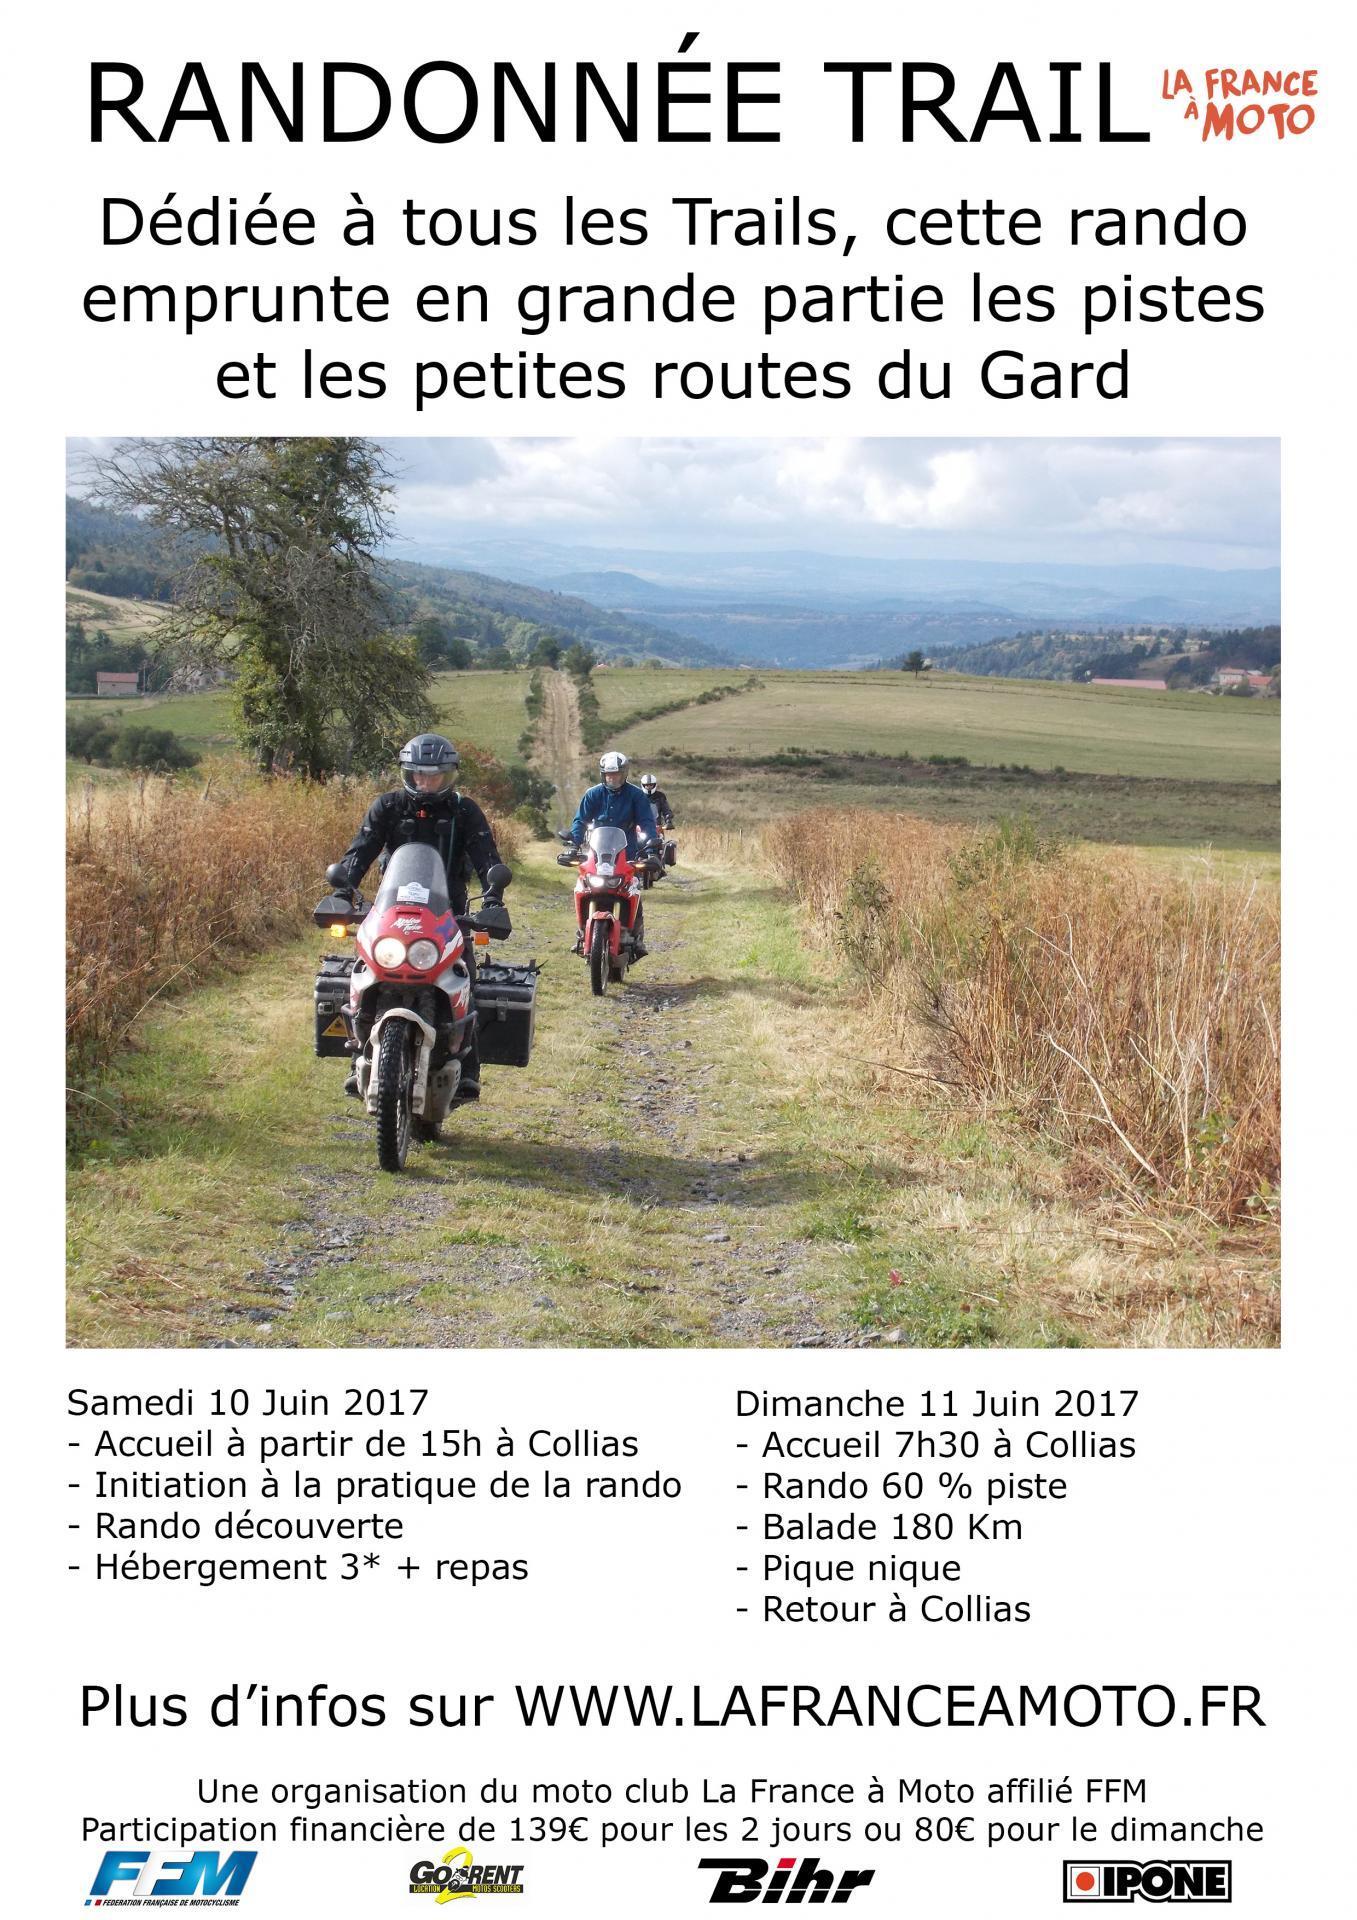 Rando trail 2018